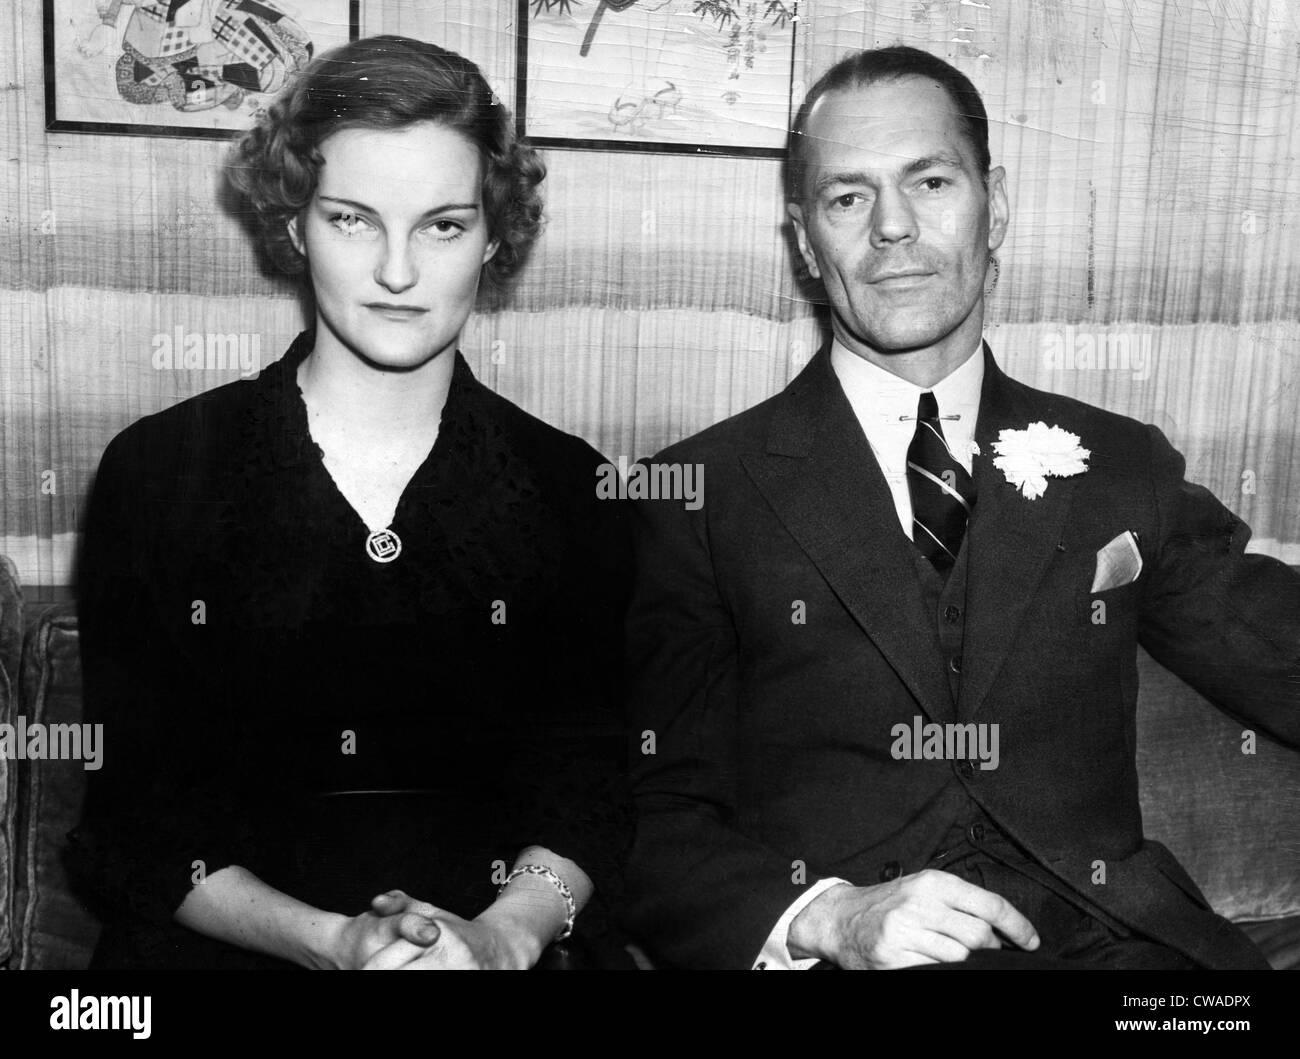 H H James: Doris Duke And Husband James H.R. Cromwell, February, 1935